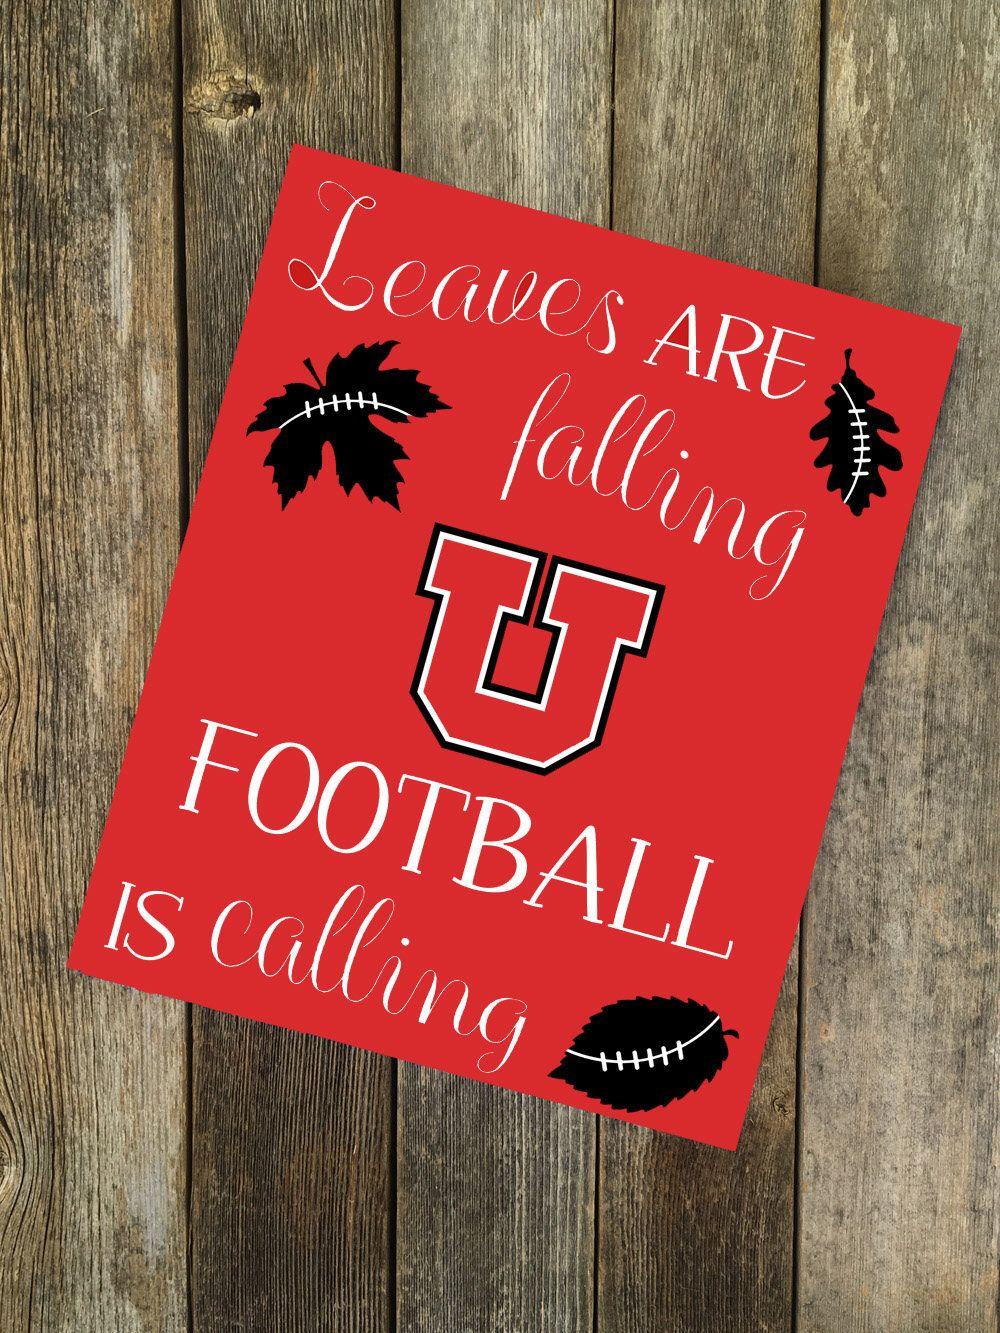 Fall Decor Fall Sign Football Utes Utah Utes Utah Utes Home Decor Utes Football University Utah Utes Football Utes Football University Of Utah Football